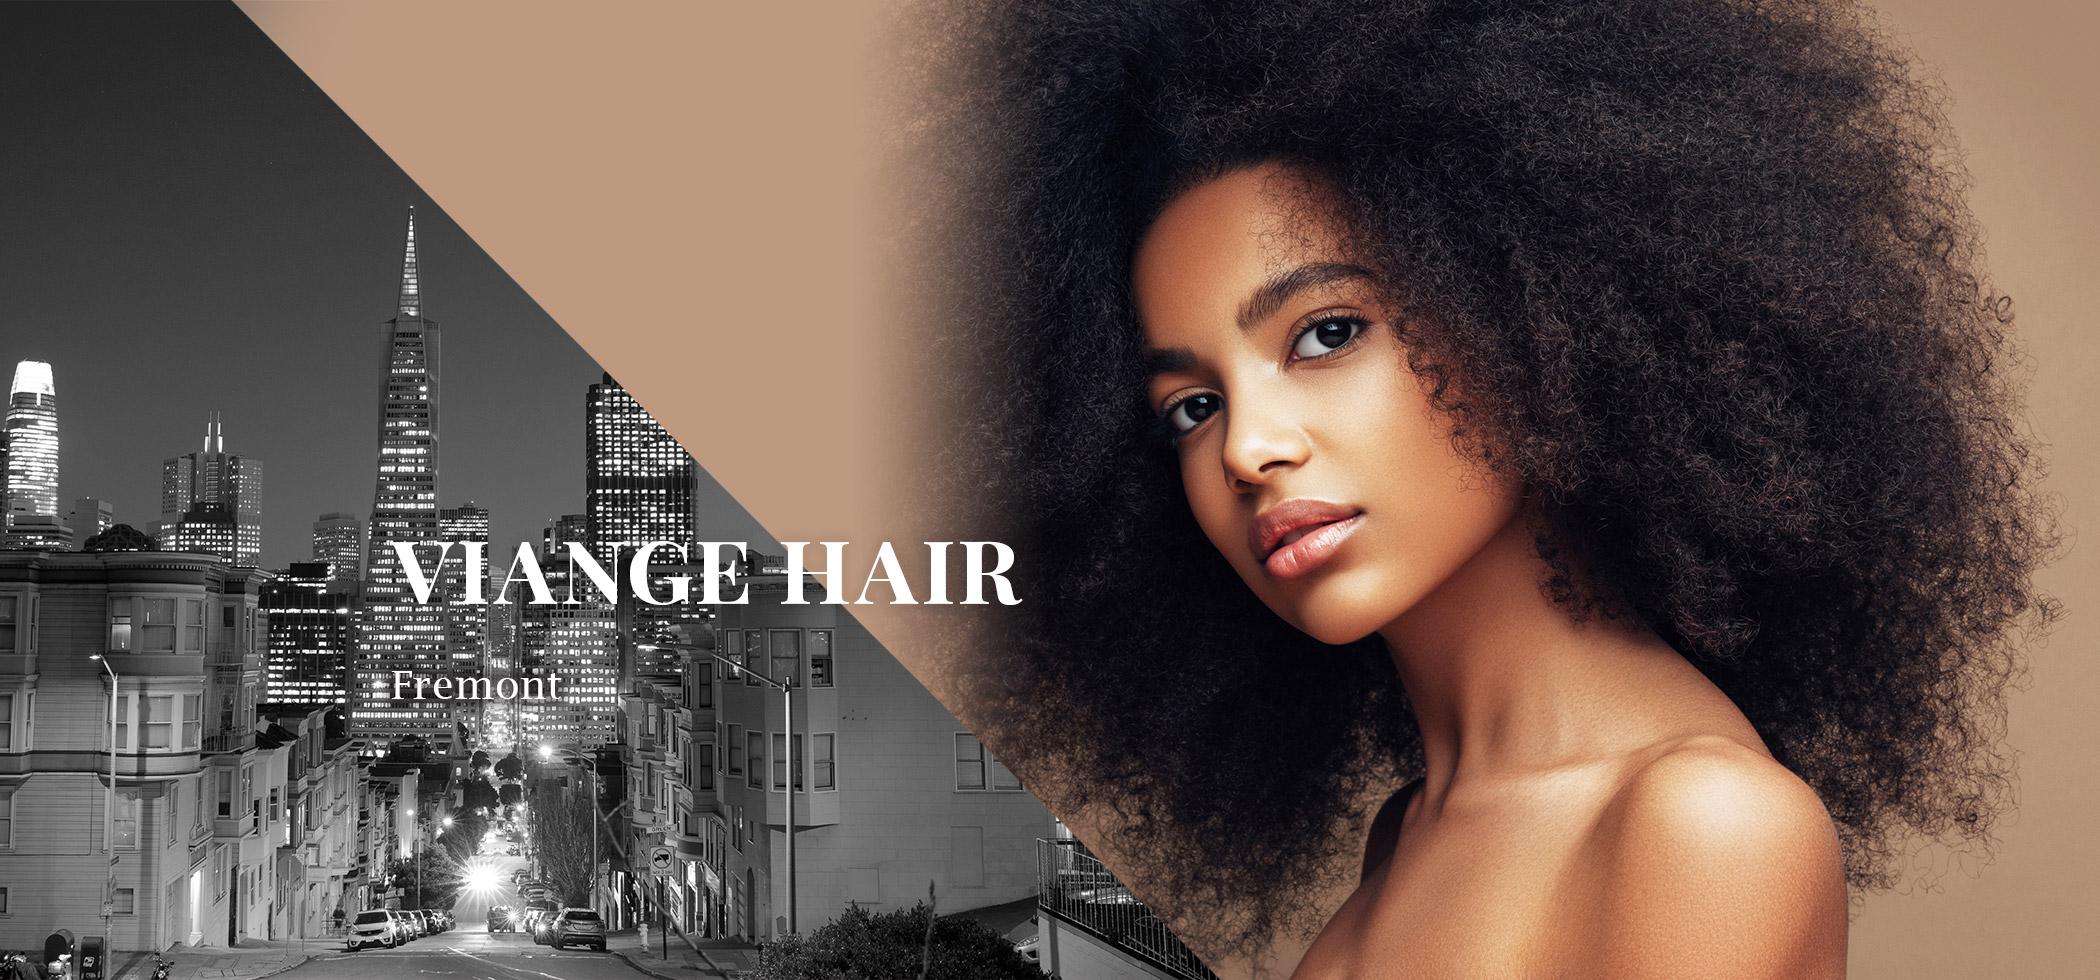 Viange Hair Fremont